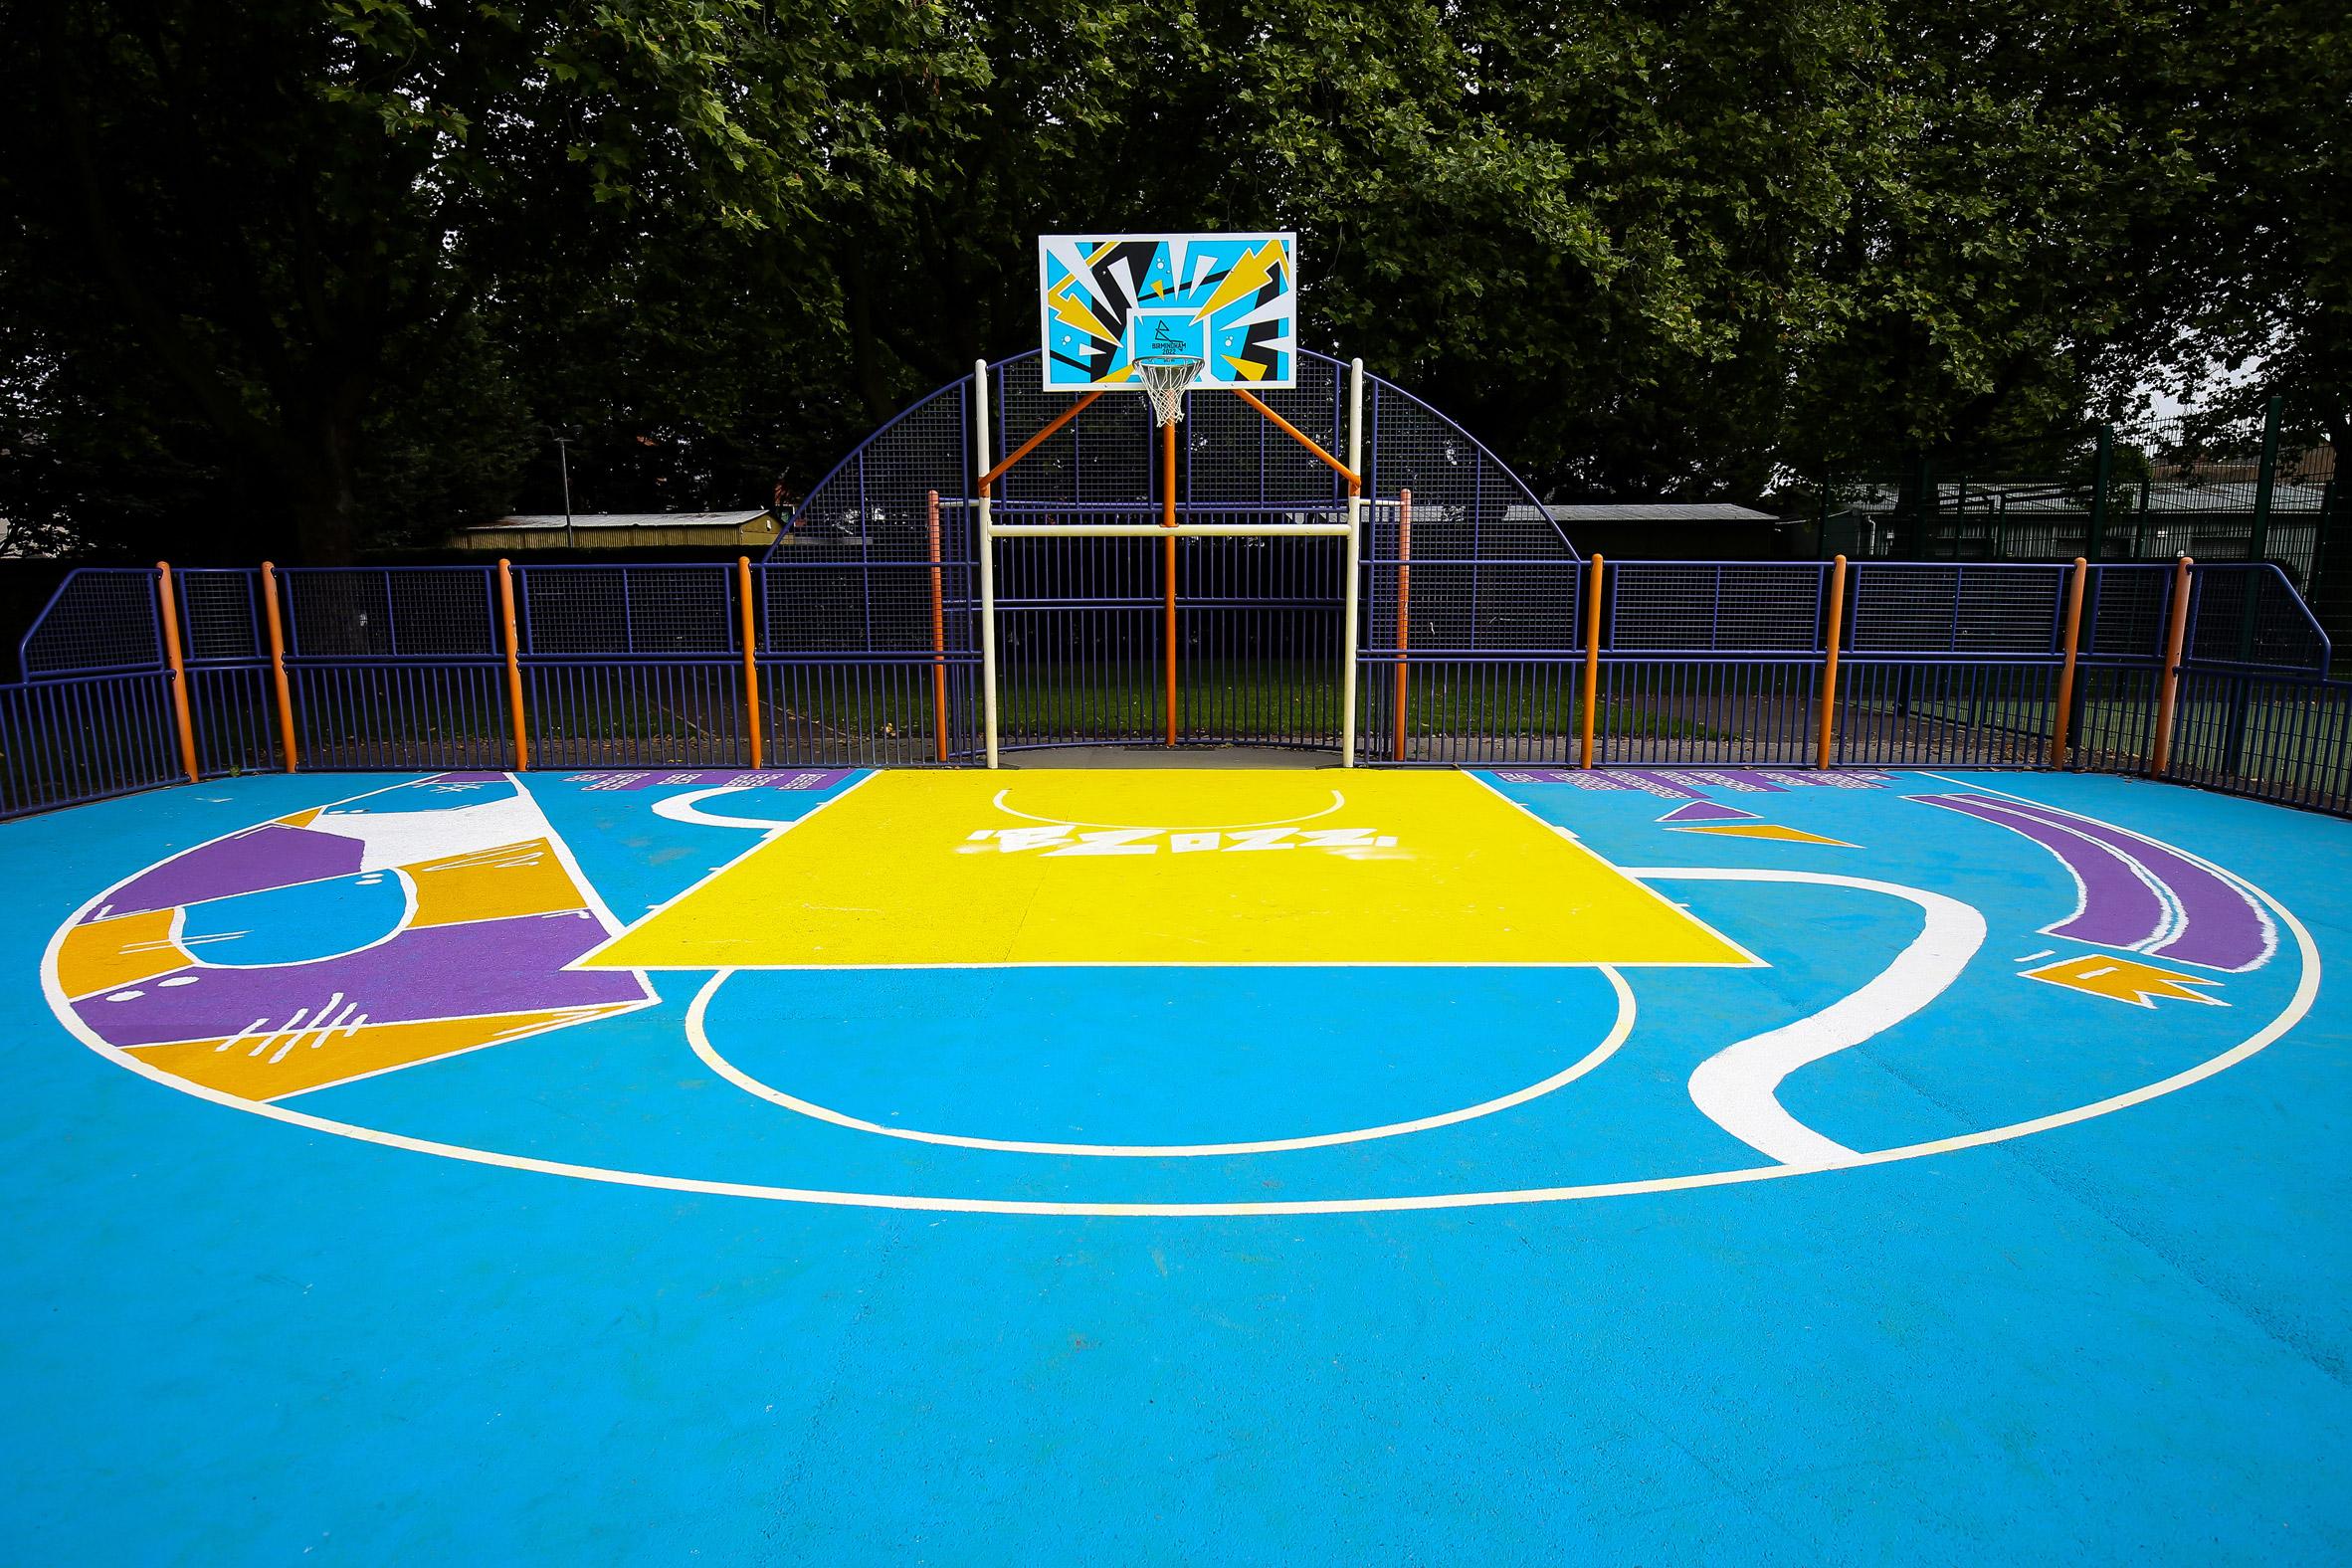 A concrete basketball court painted blue